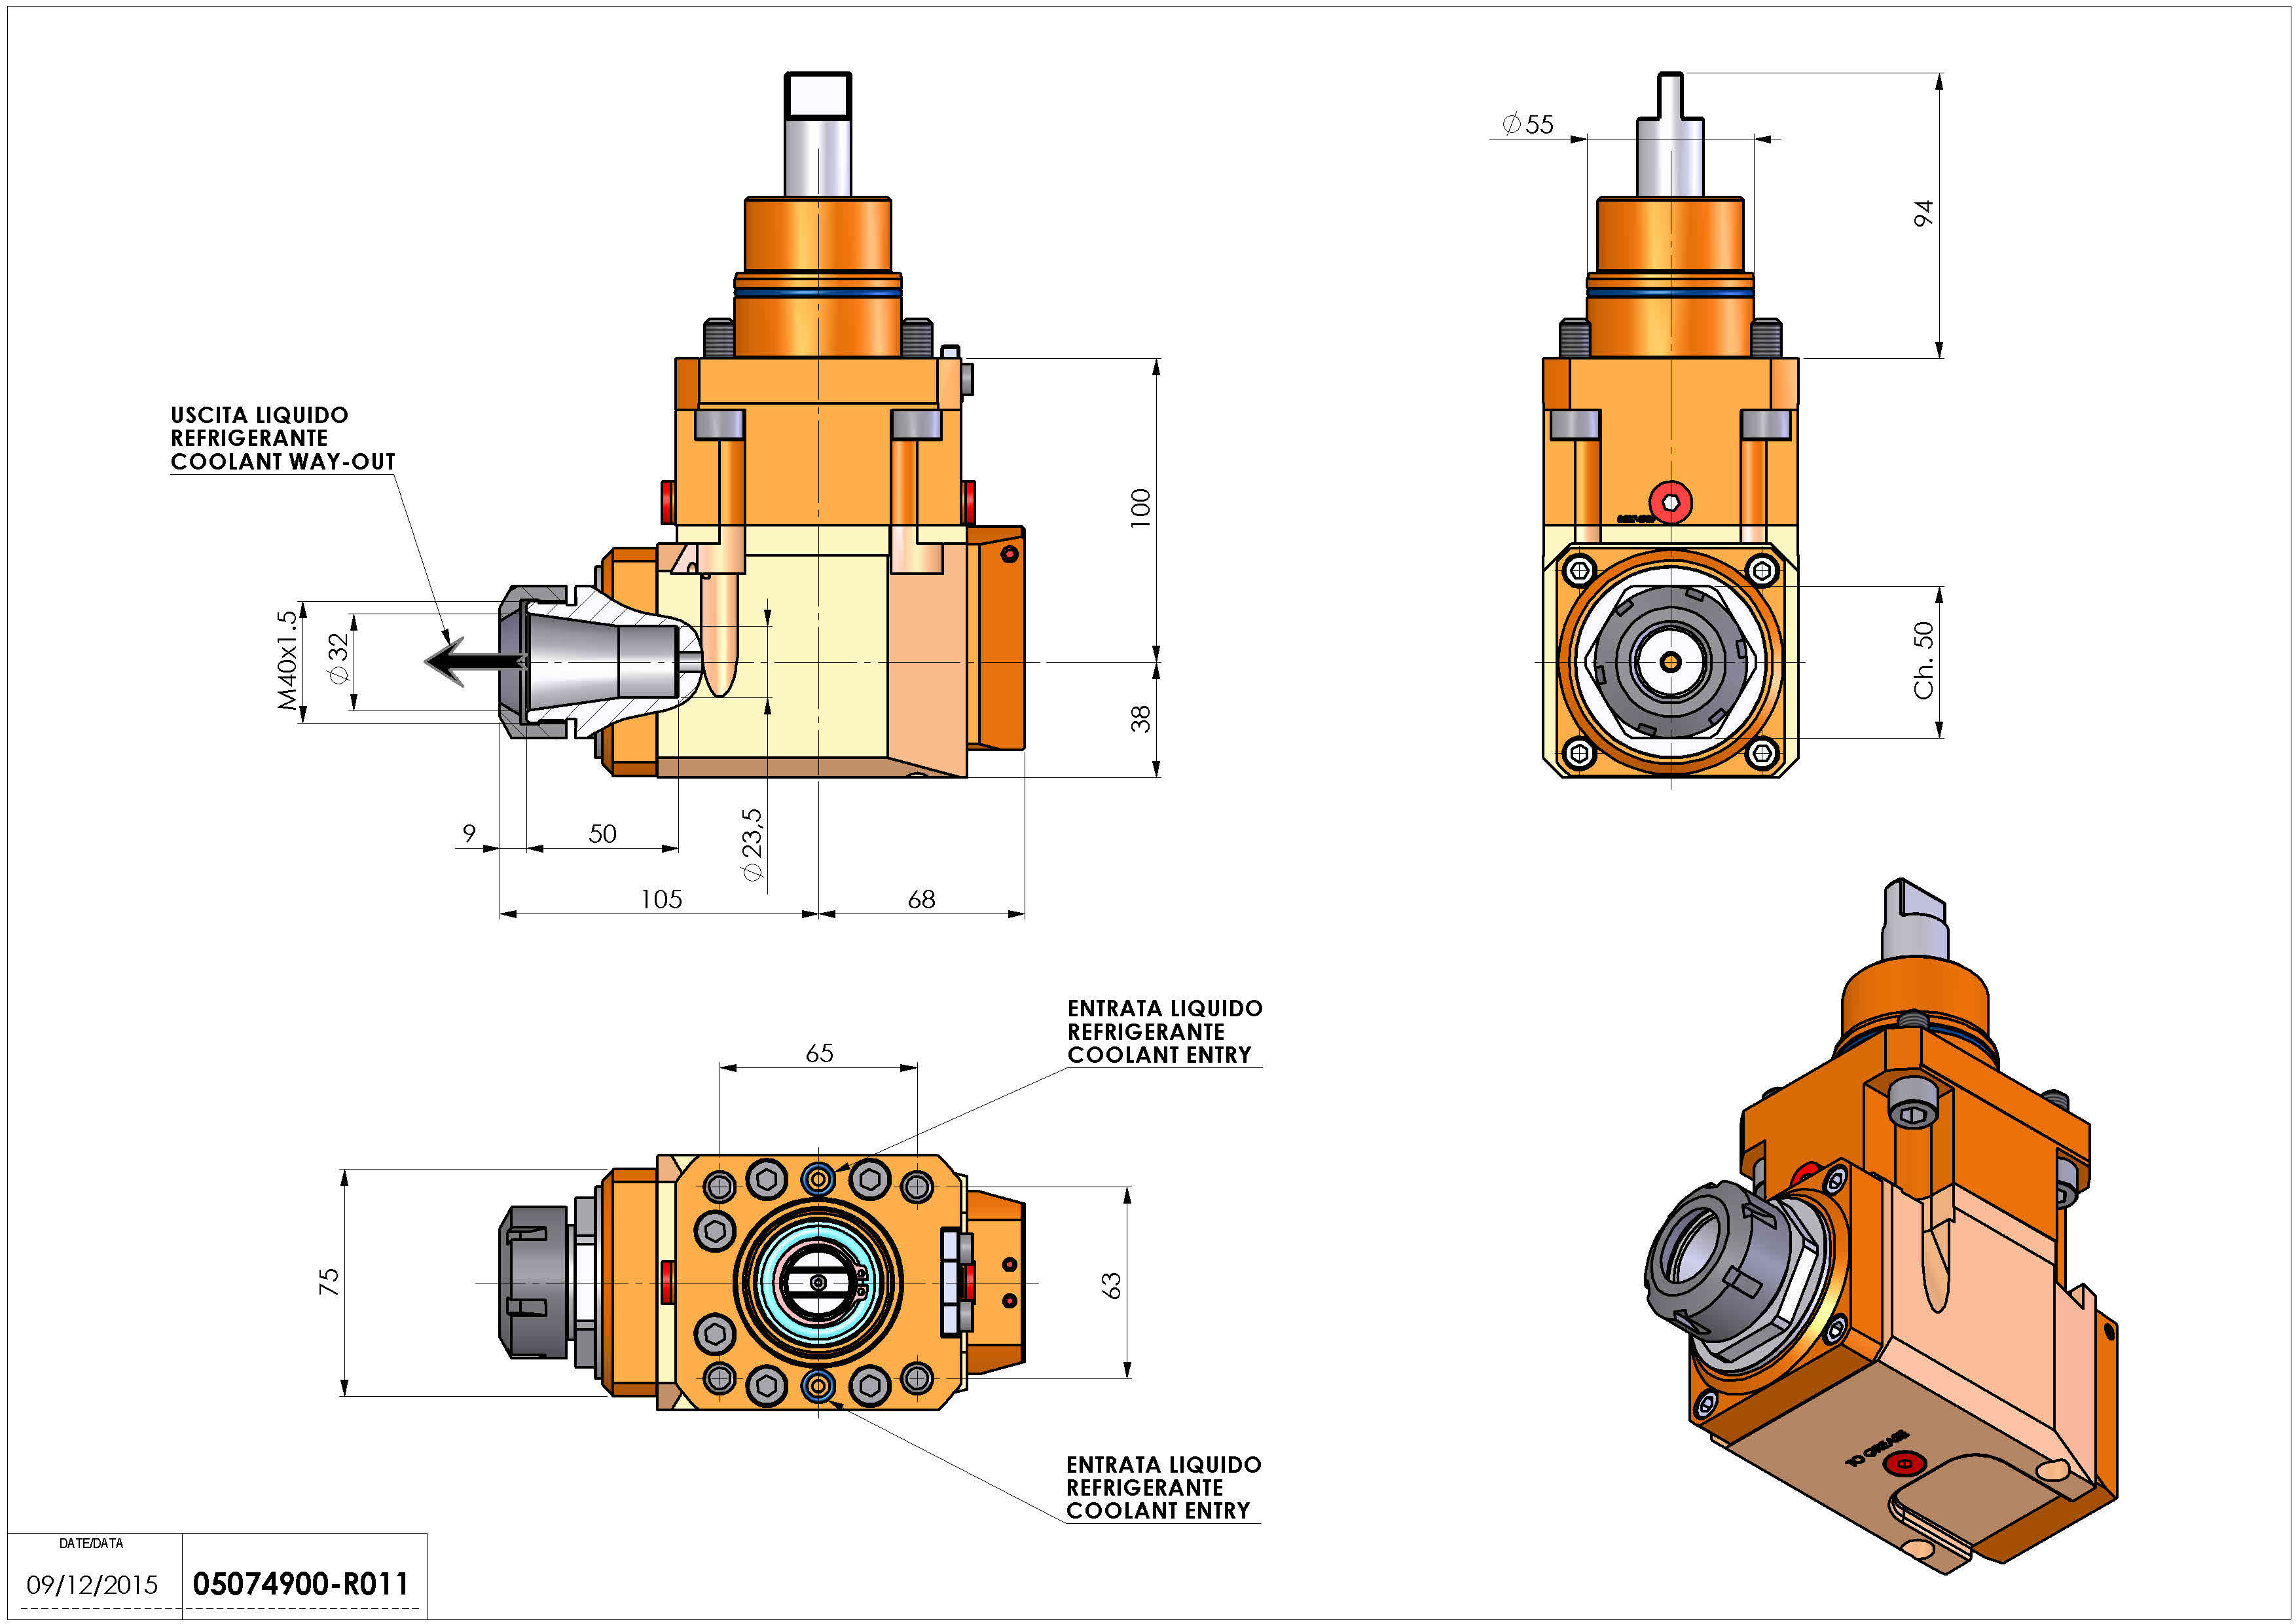 Technical image - LT-A D55 ER32 LR RF H100 BI.